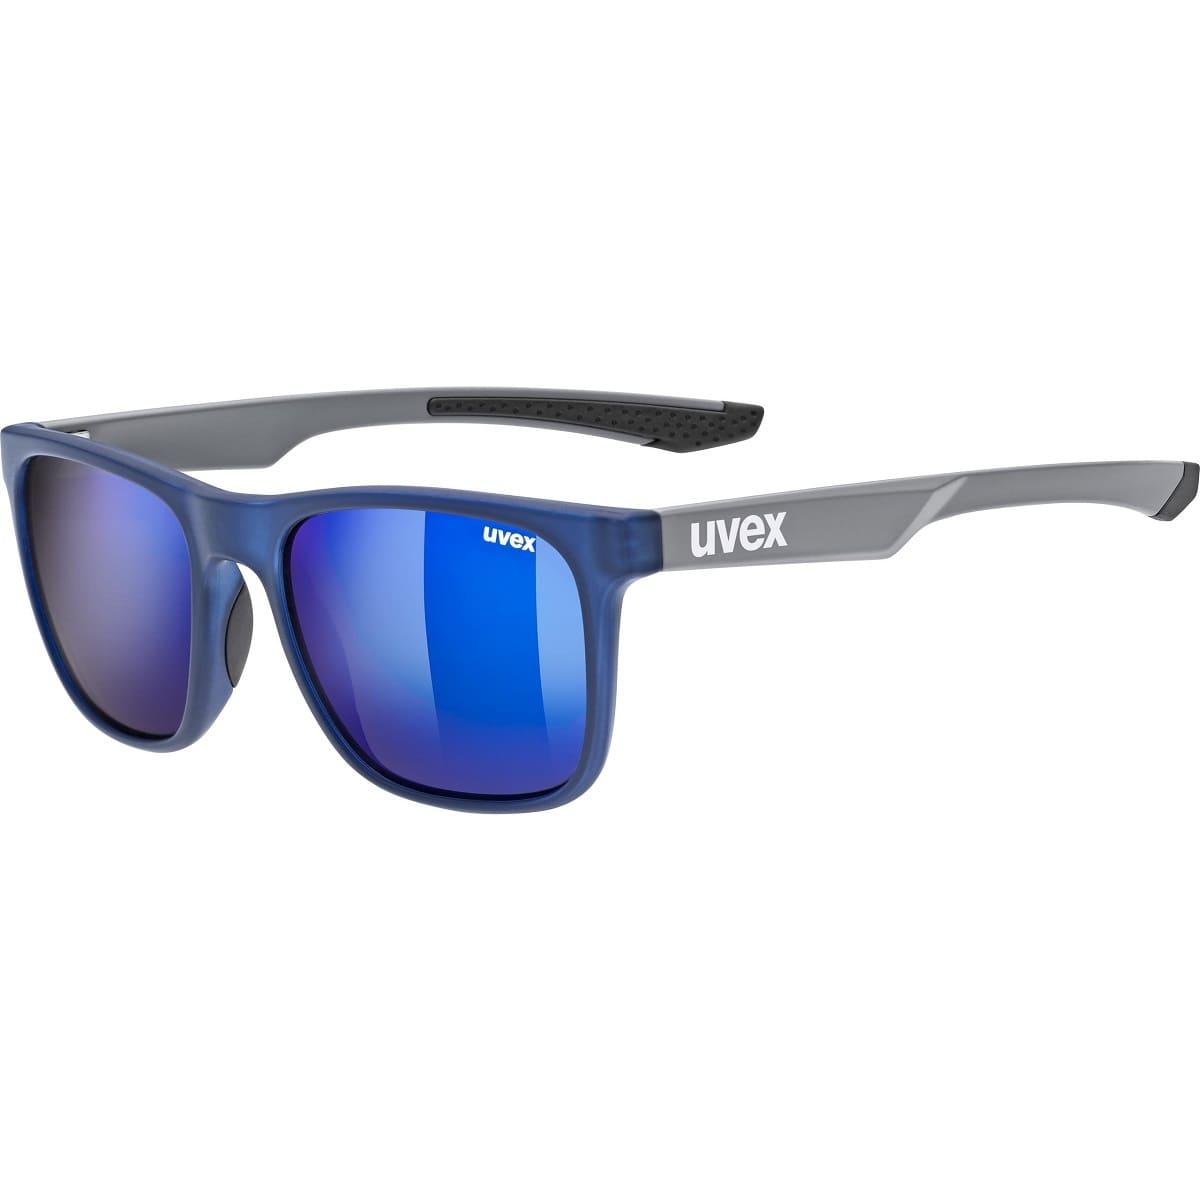 Uvex lgl 42 Blue Grey Mat